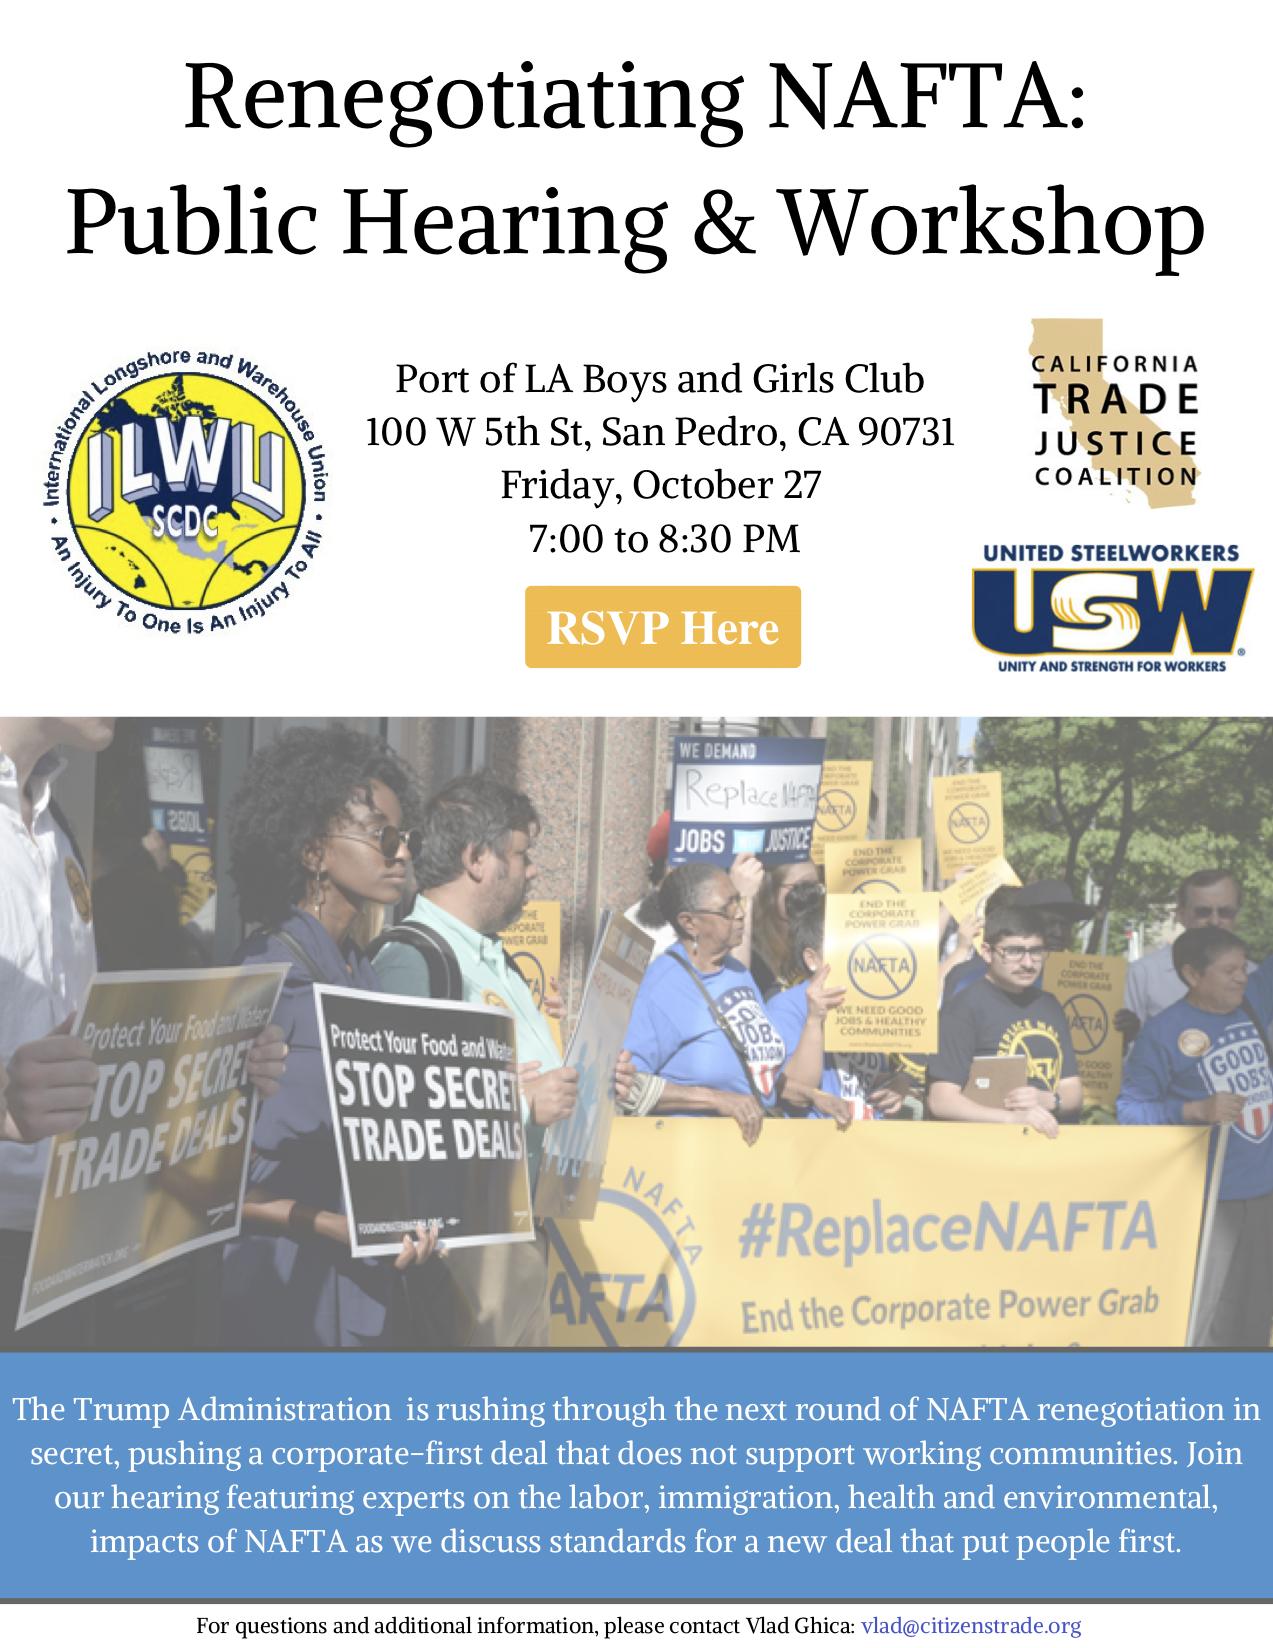 San Pedro NAFTA Public Hearing copy.jpg